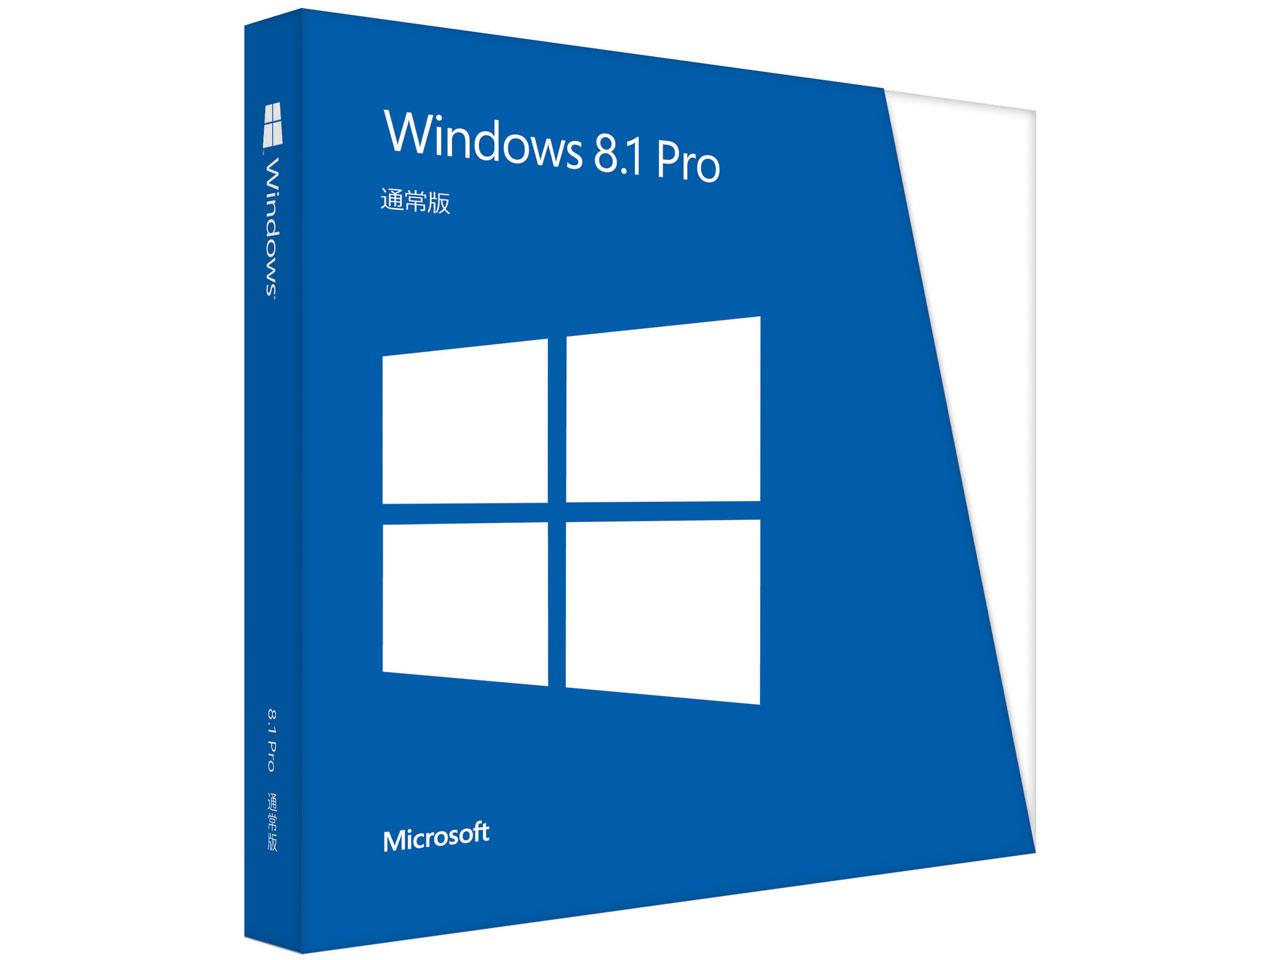 Microsoft Windows 8.1 Pro 32-bit/64-bit Romanian DVD Retail